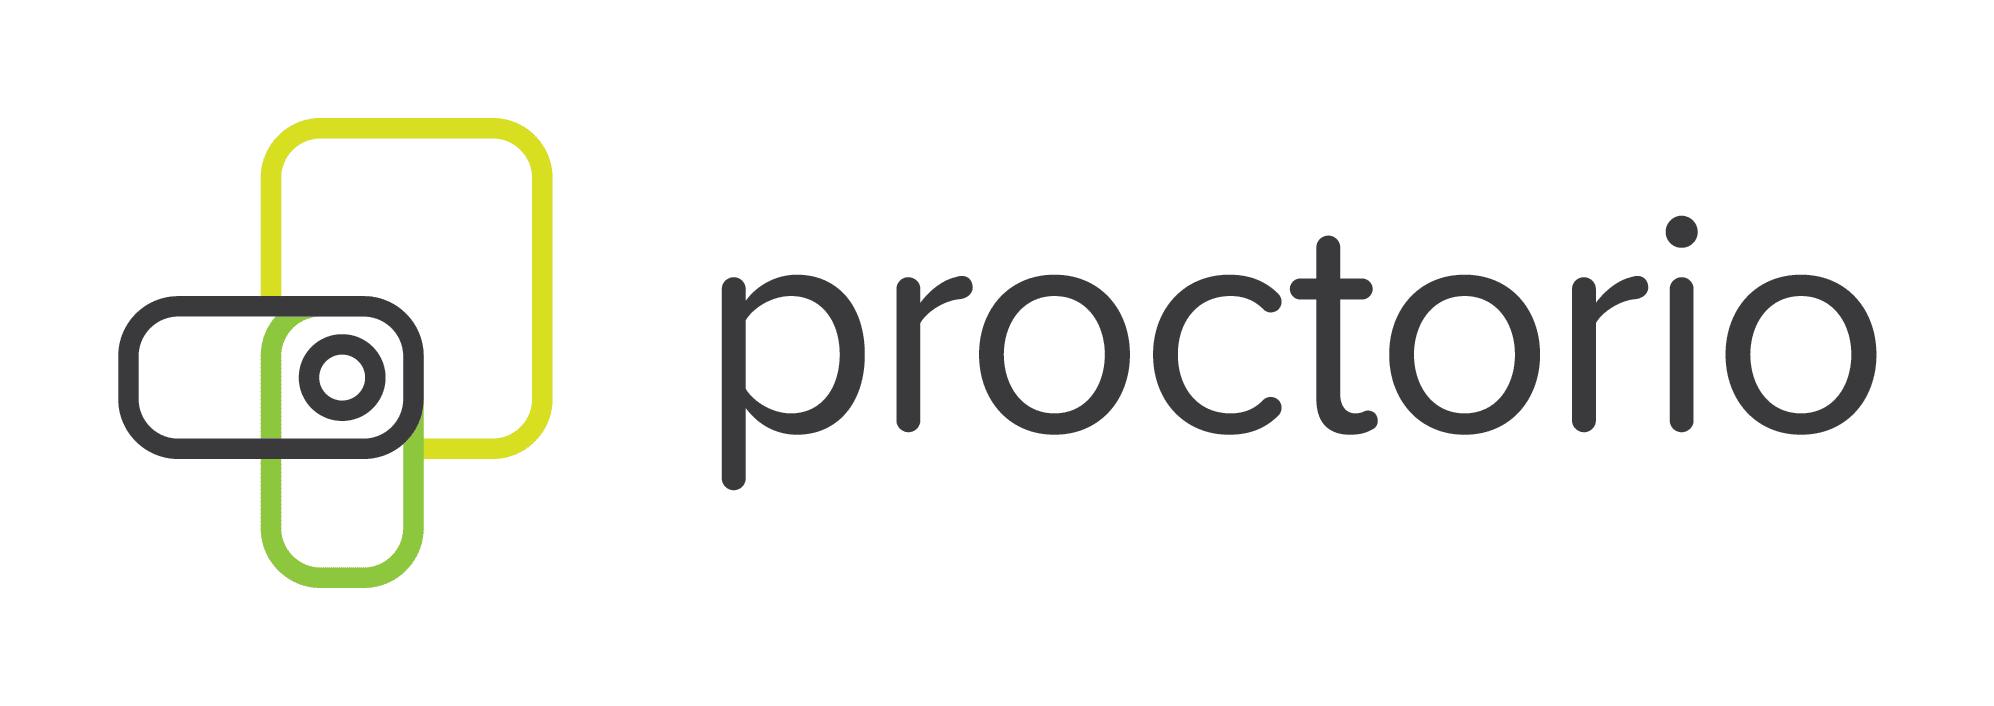 proctorio_logo